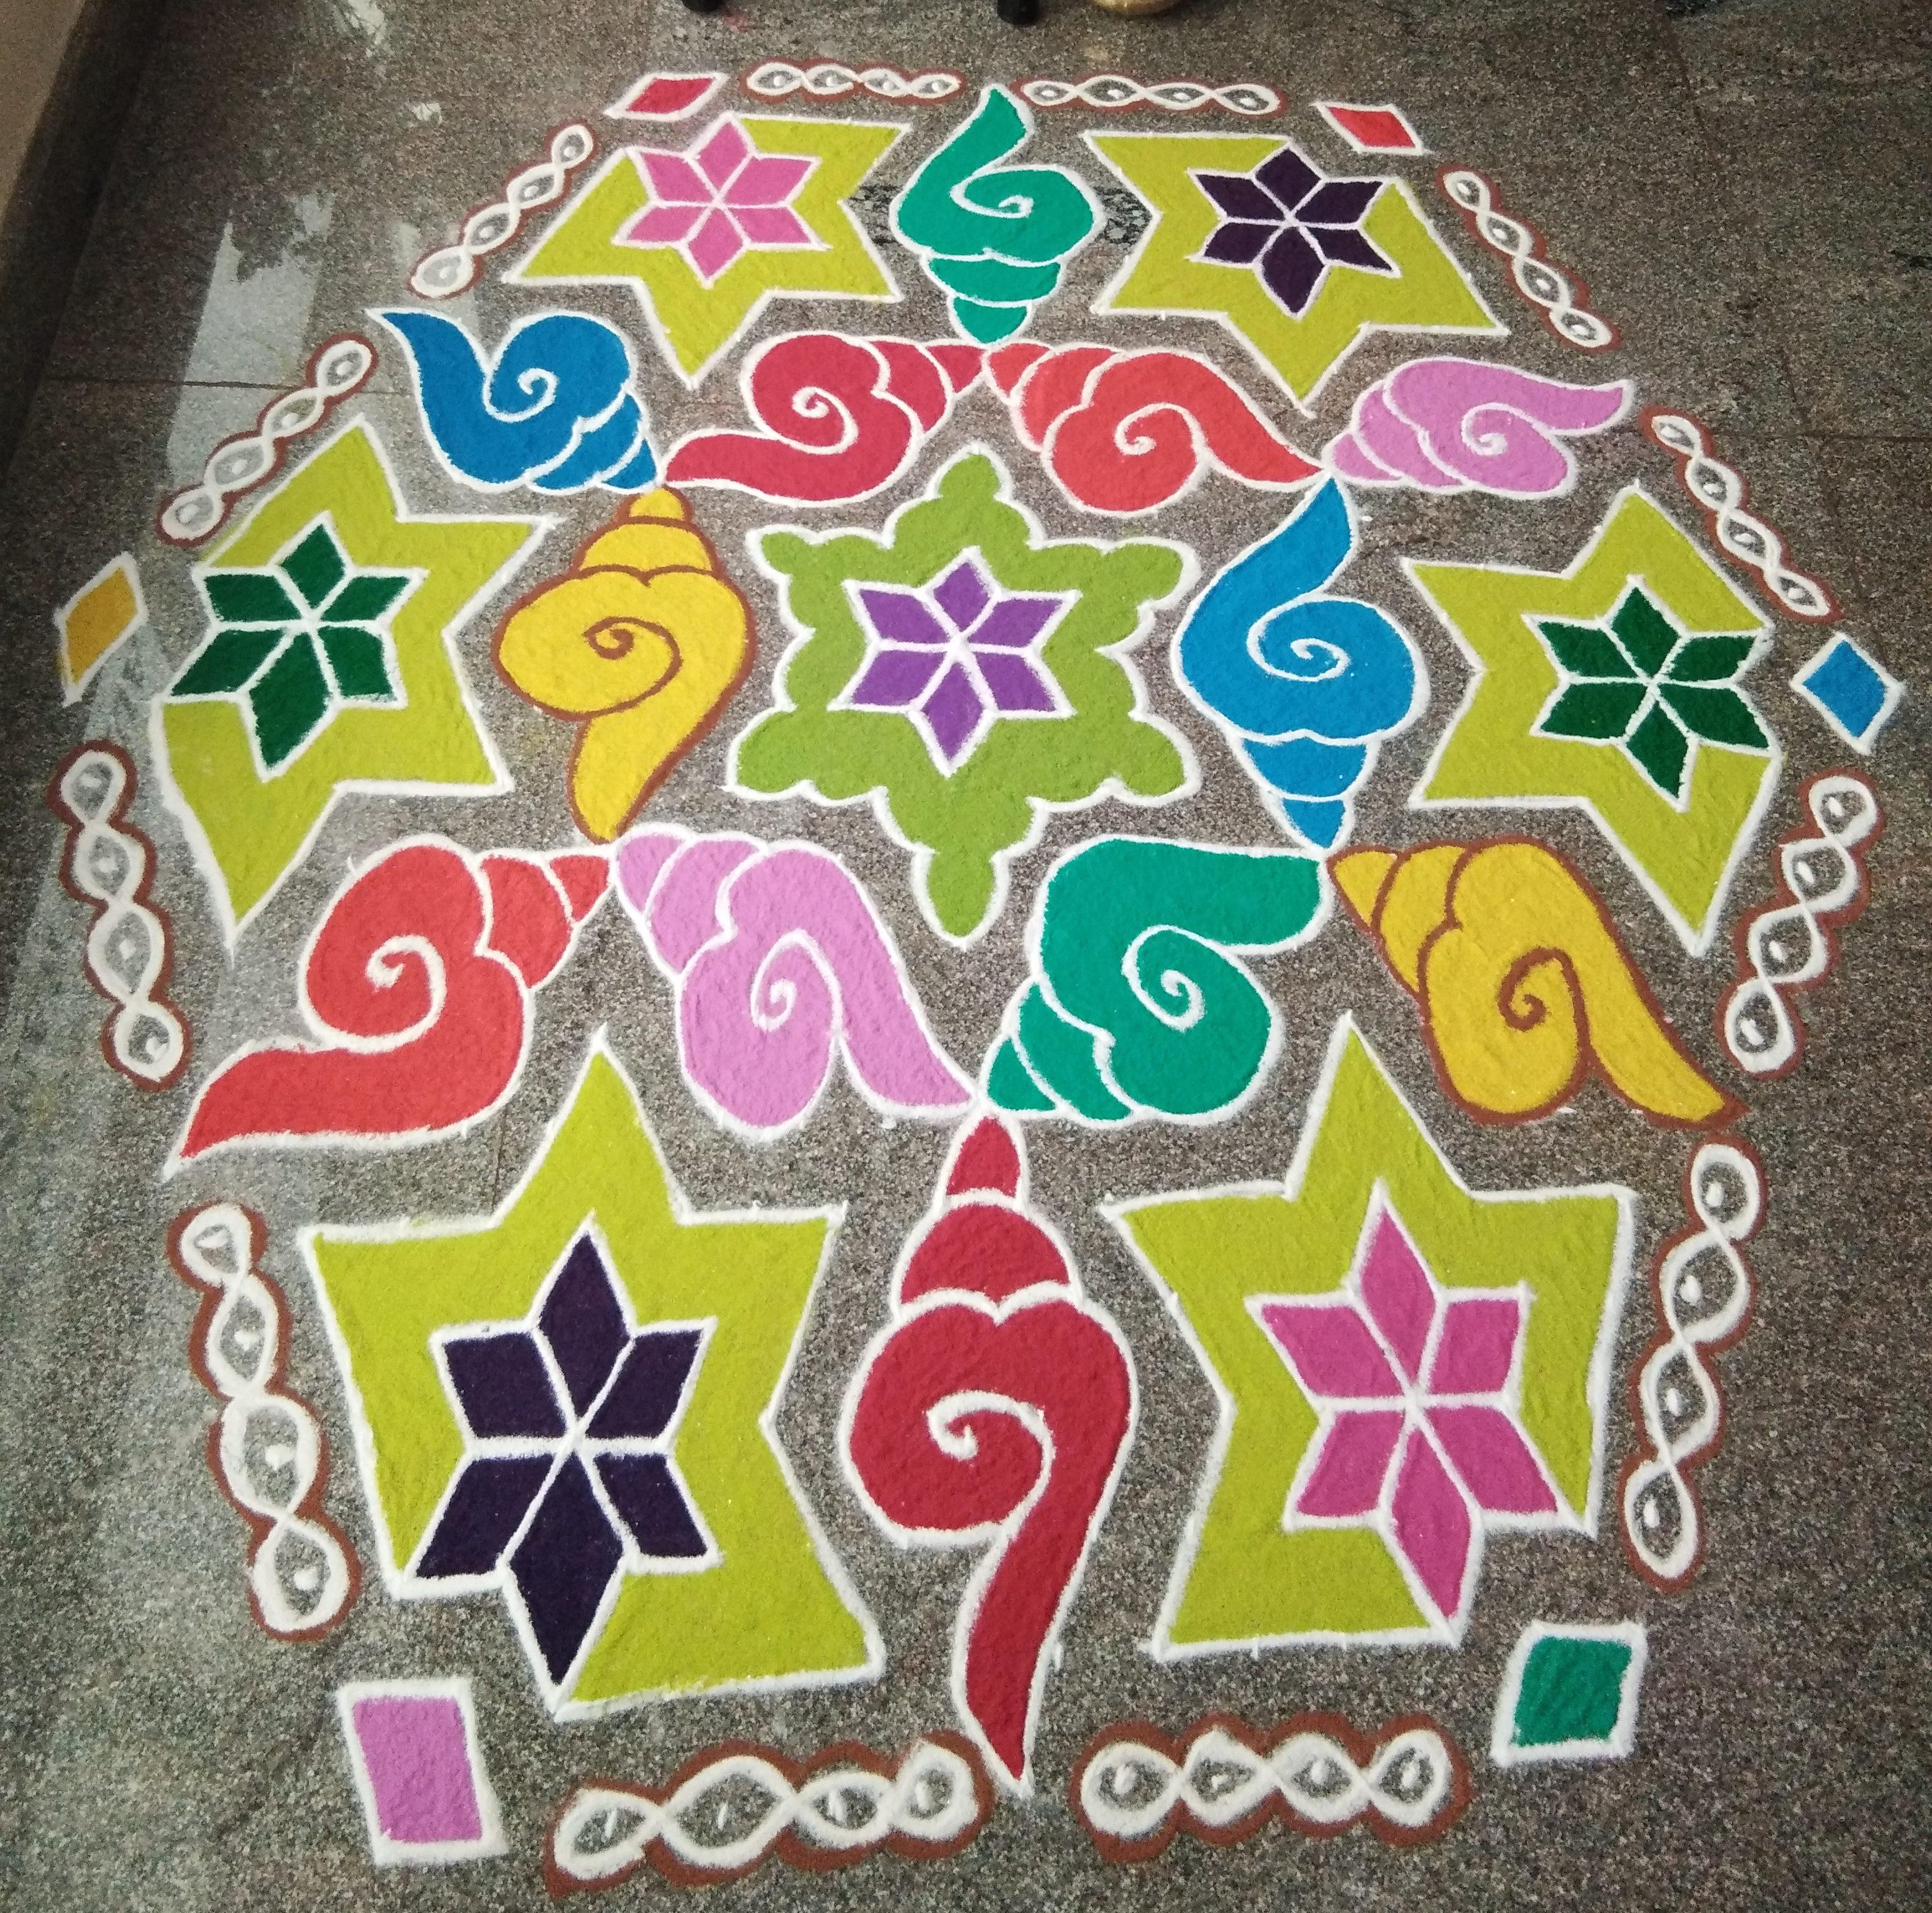 Sangu Kolam with 25 dots for contest